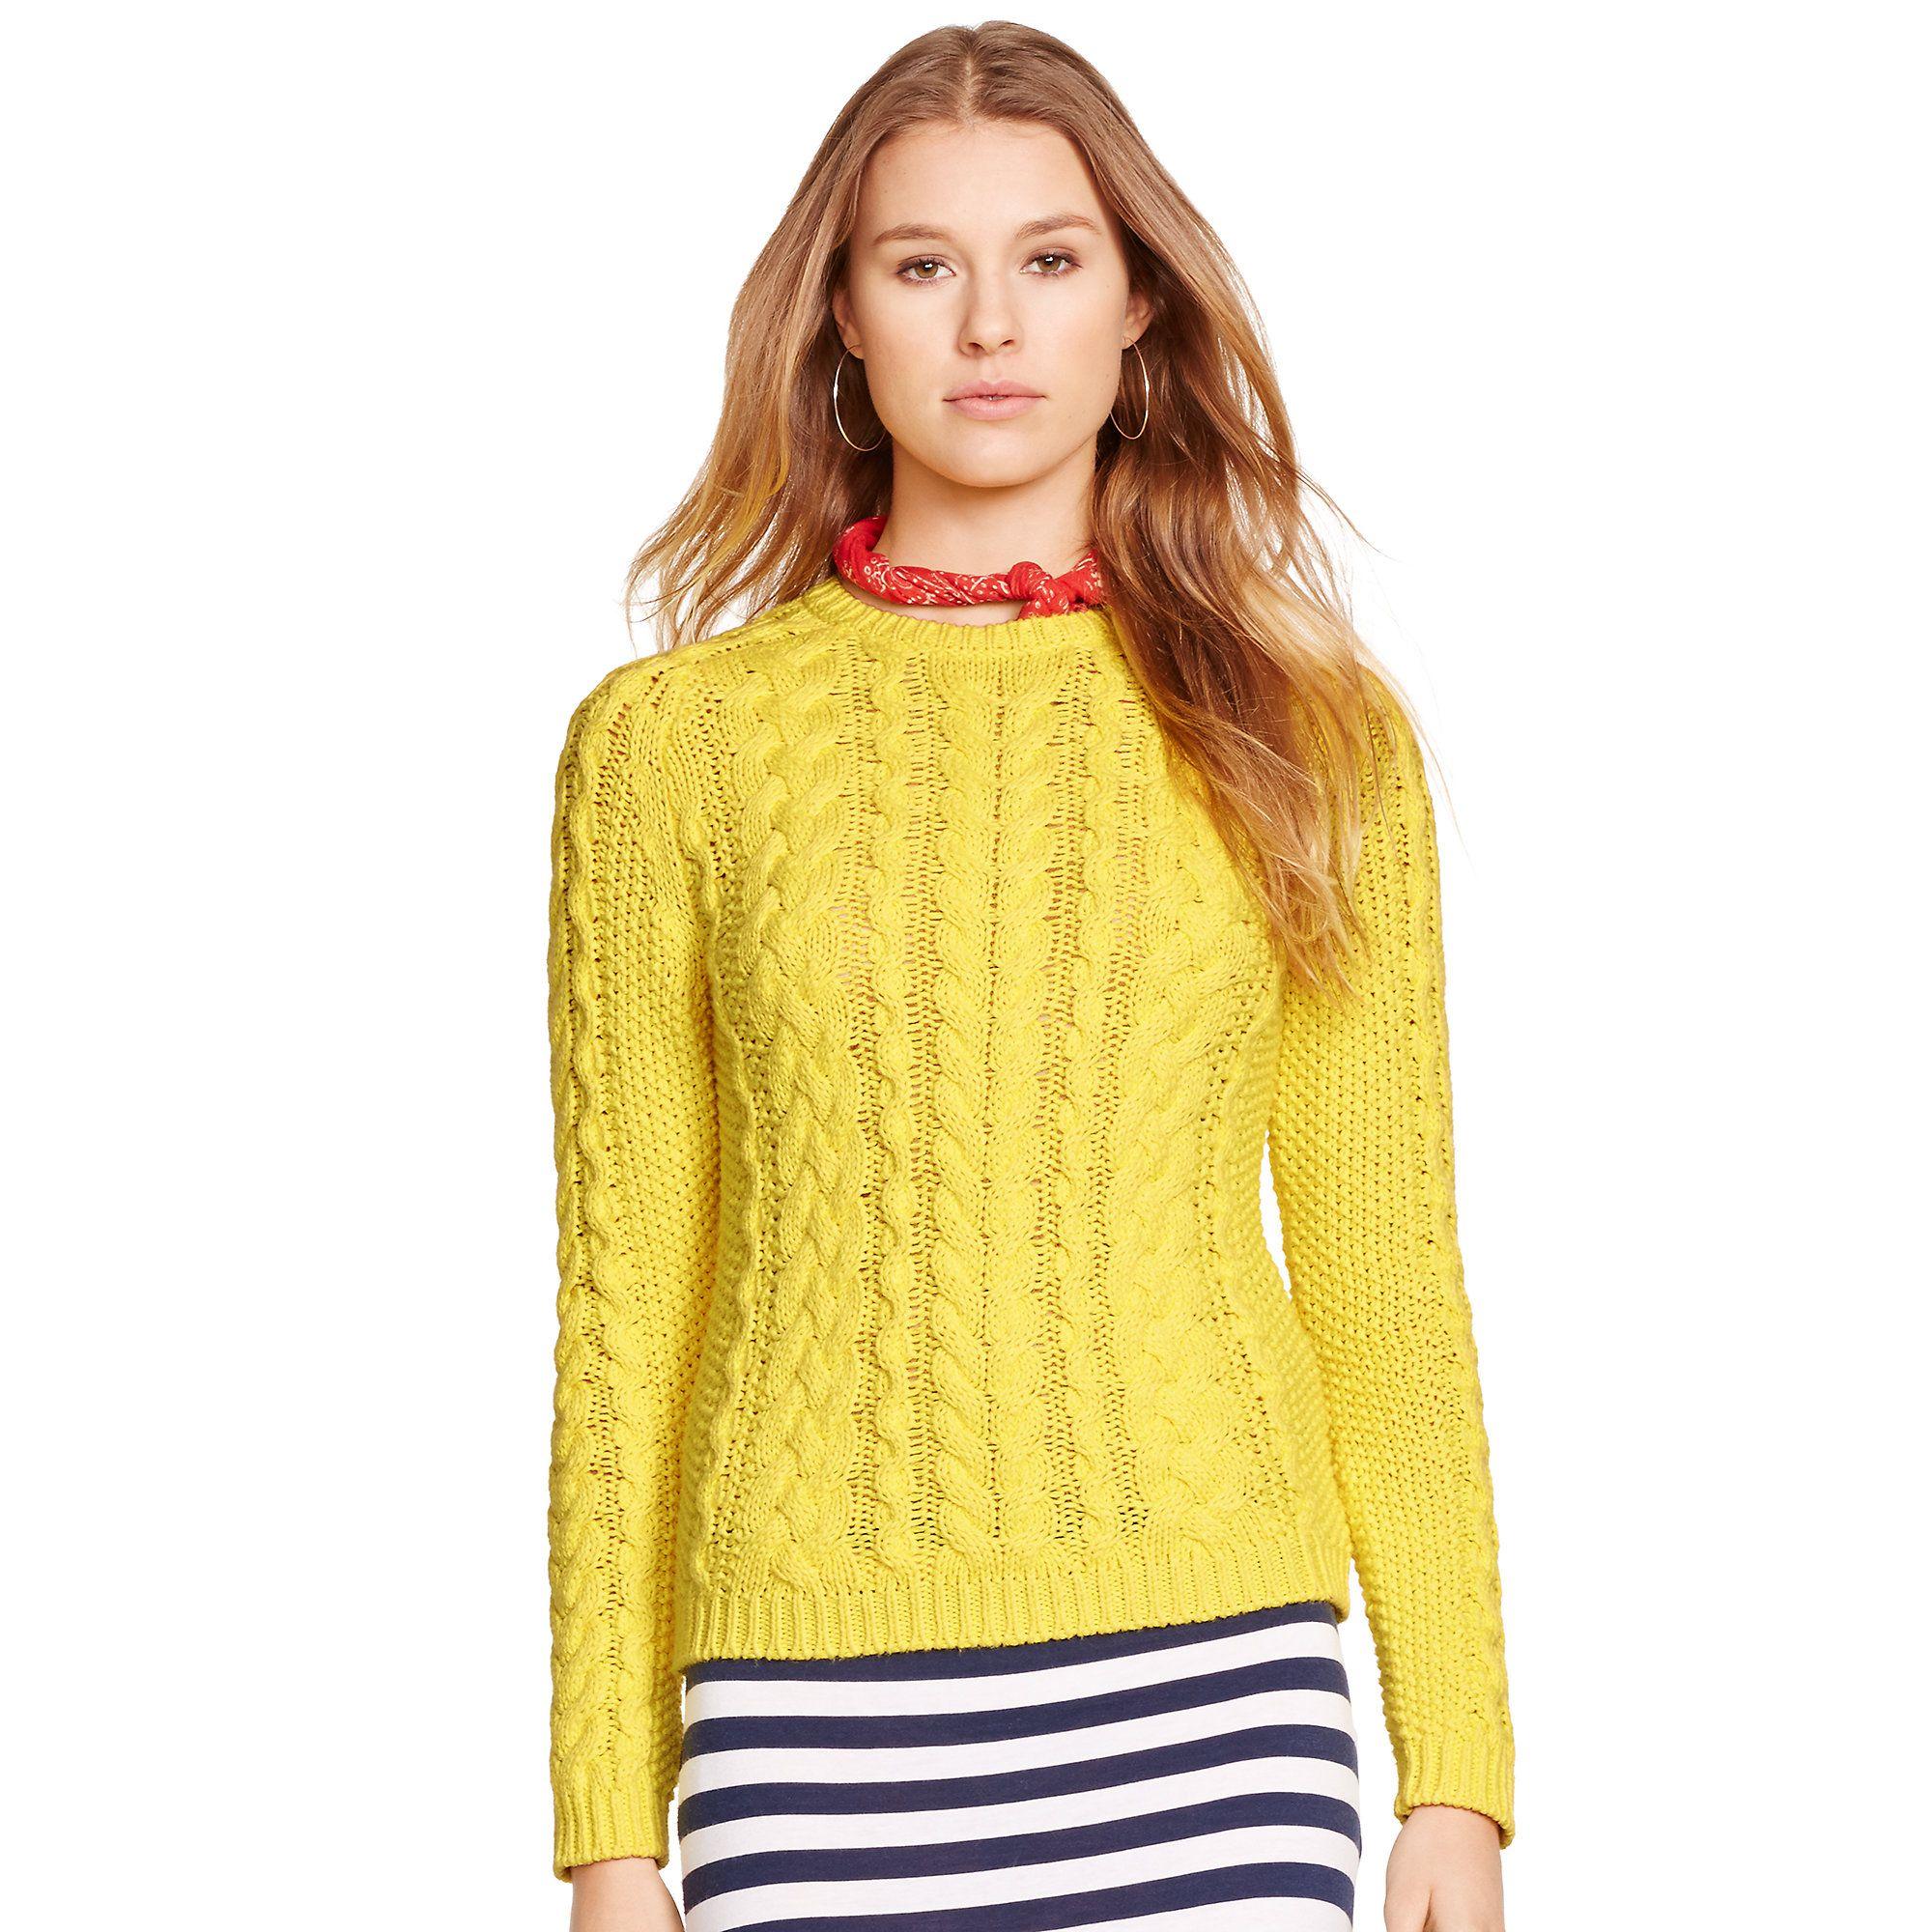 yellow-sweater-women | Yellow Sweater | Pinterest | Sweaters ...